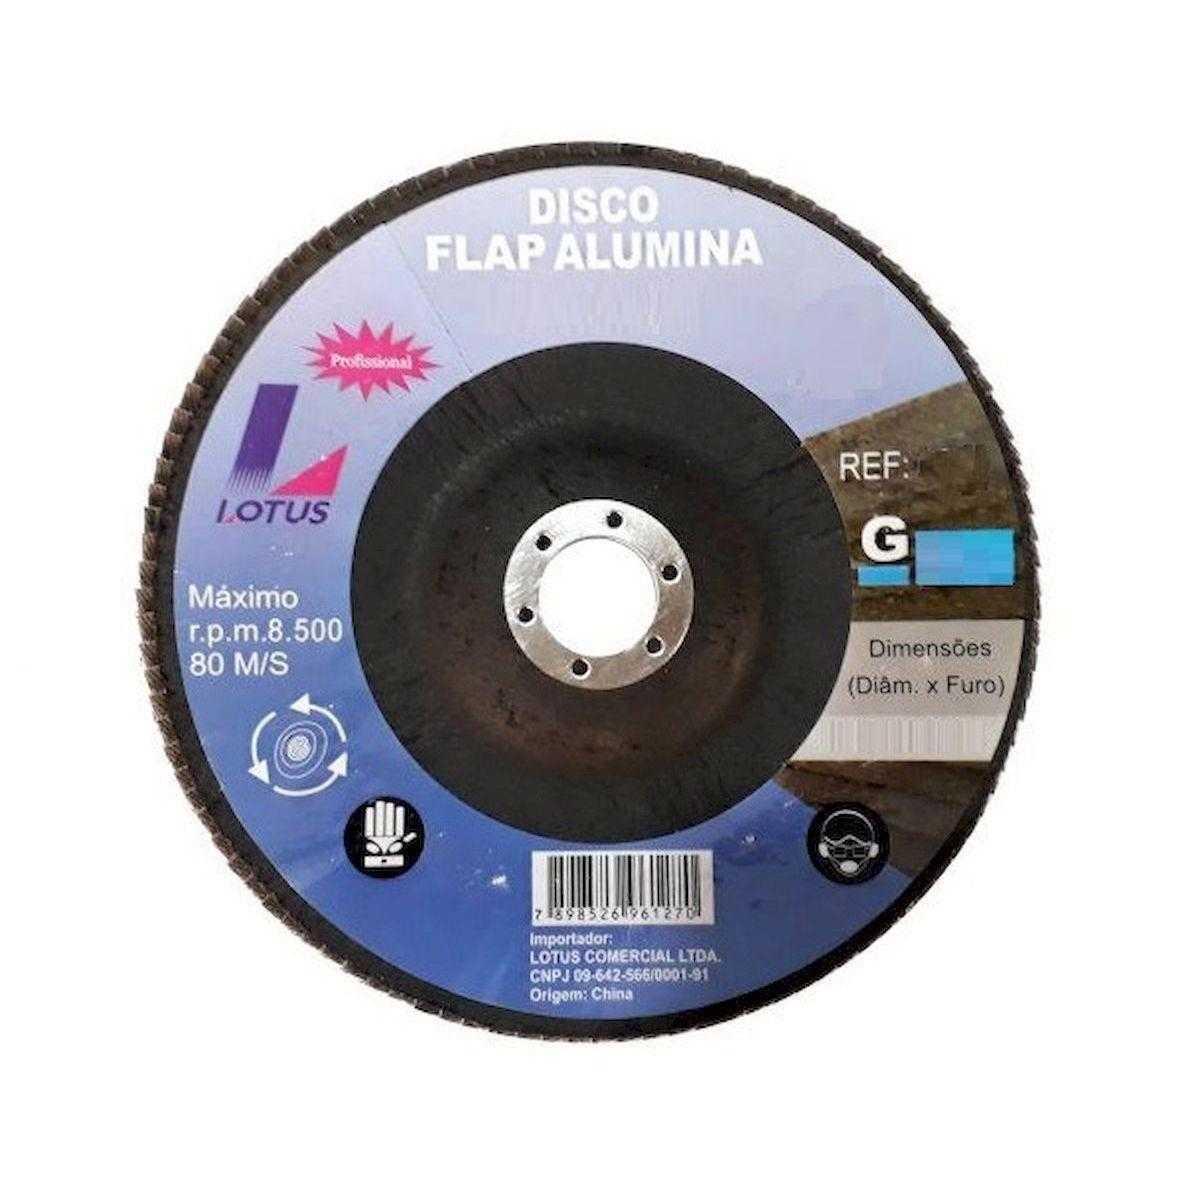 "Flap Disco Lotus 7"" Gr60"